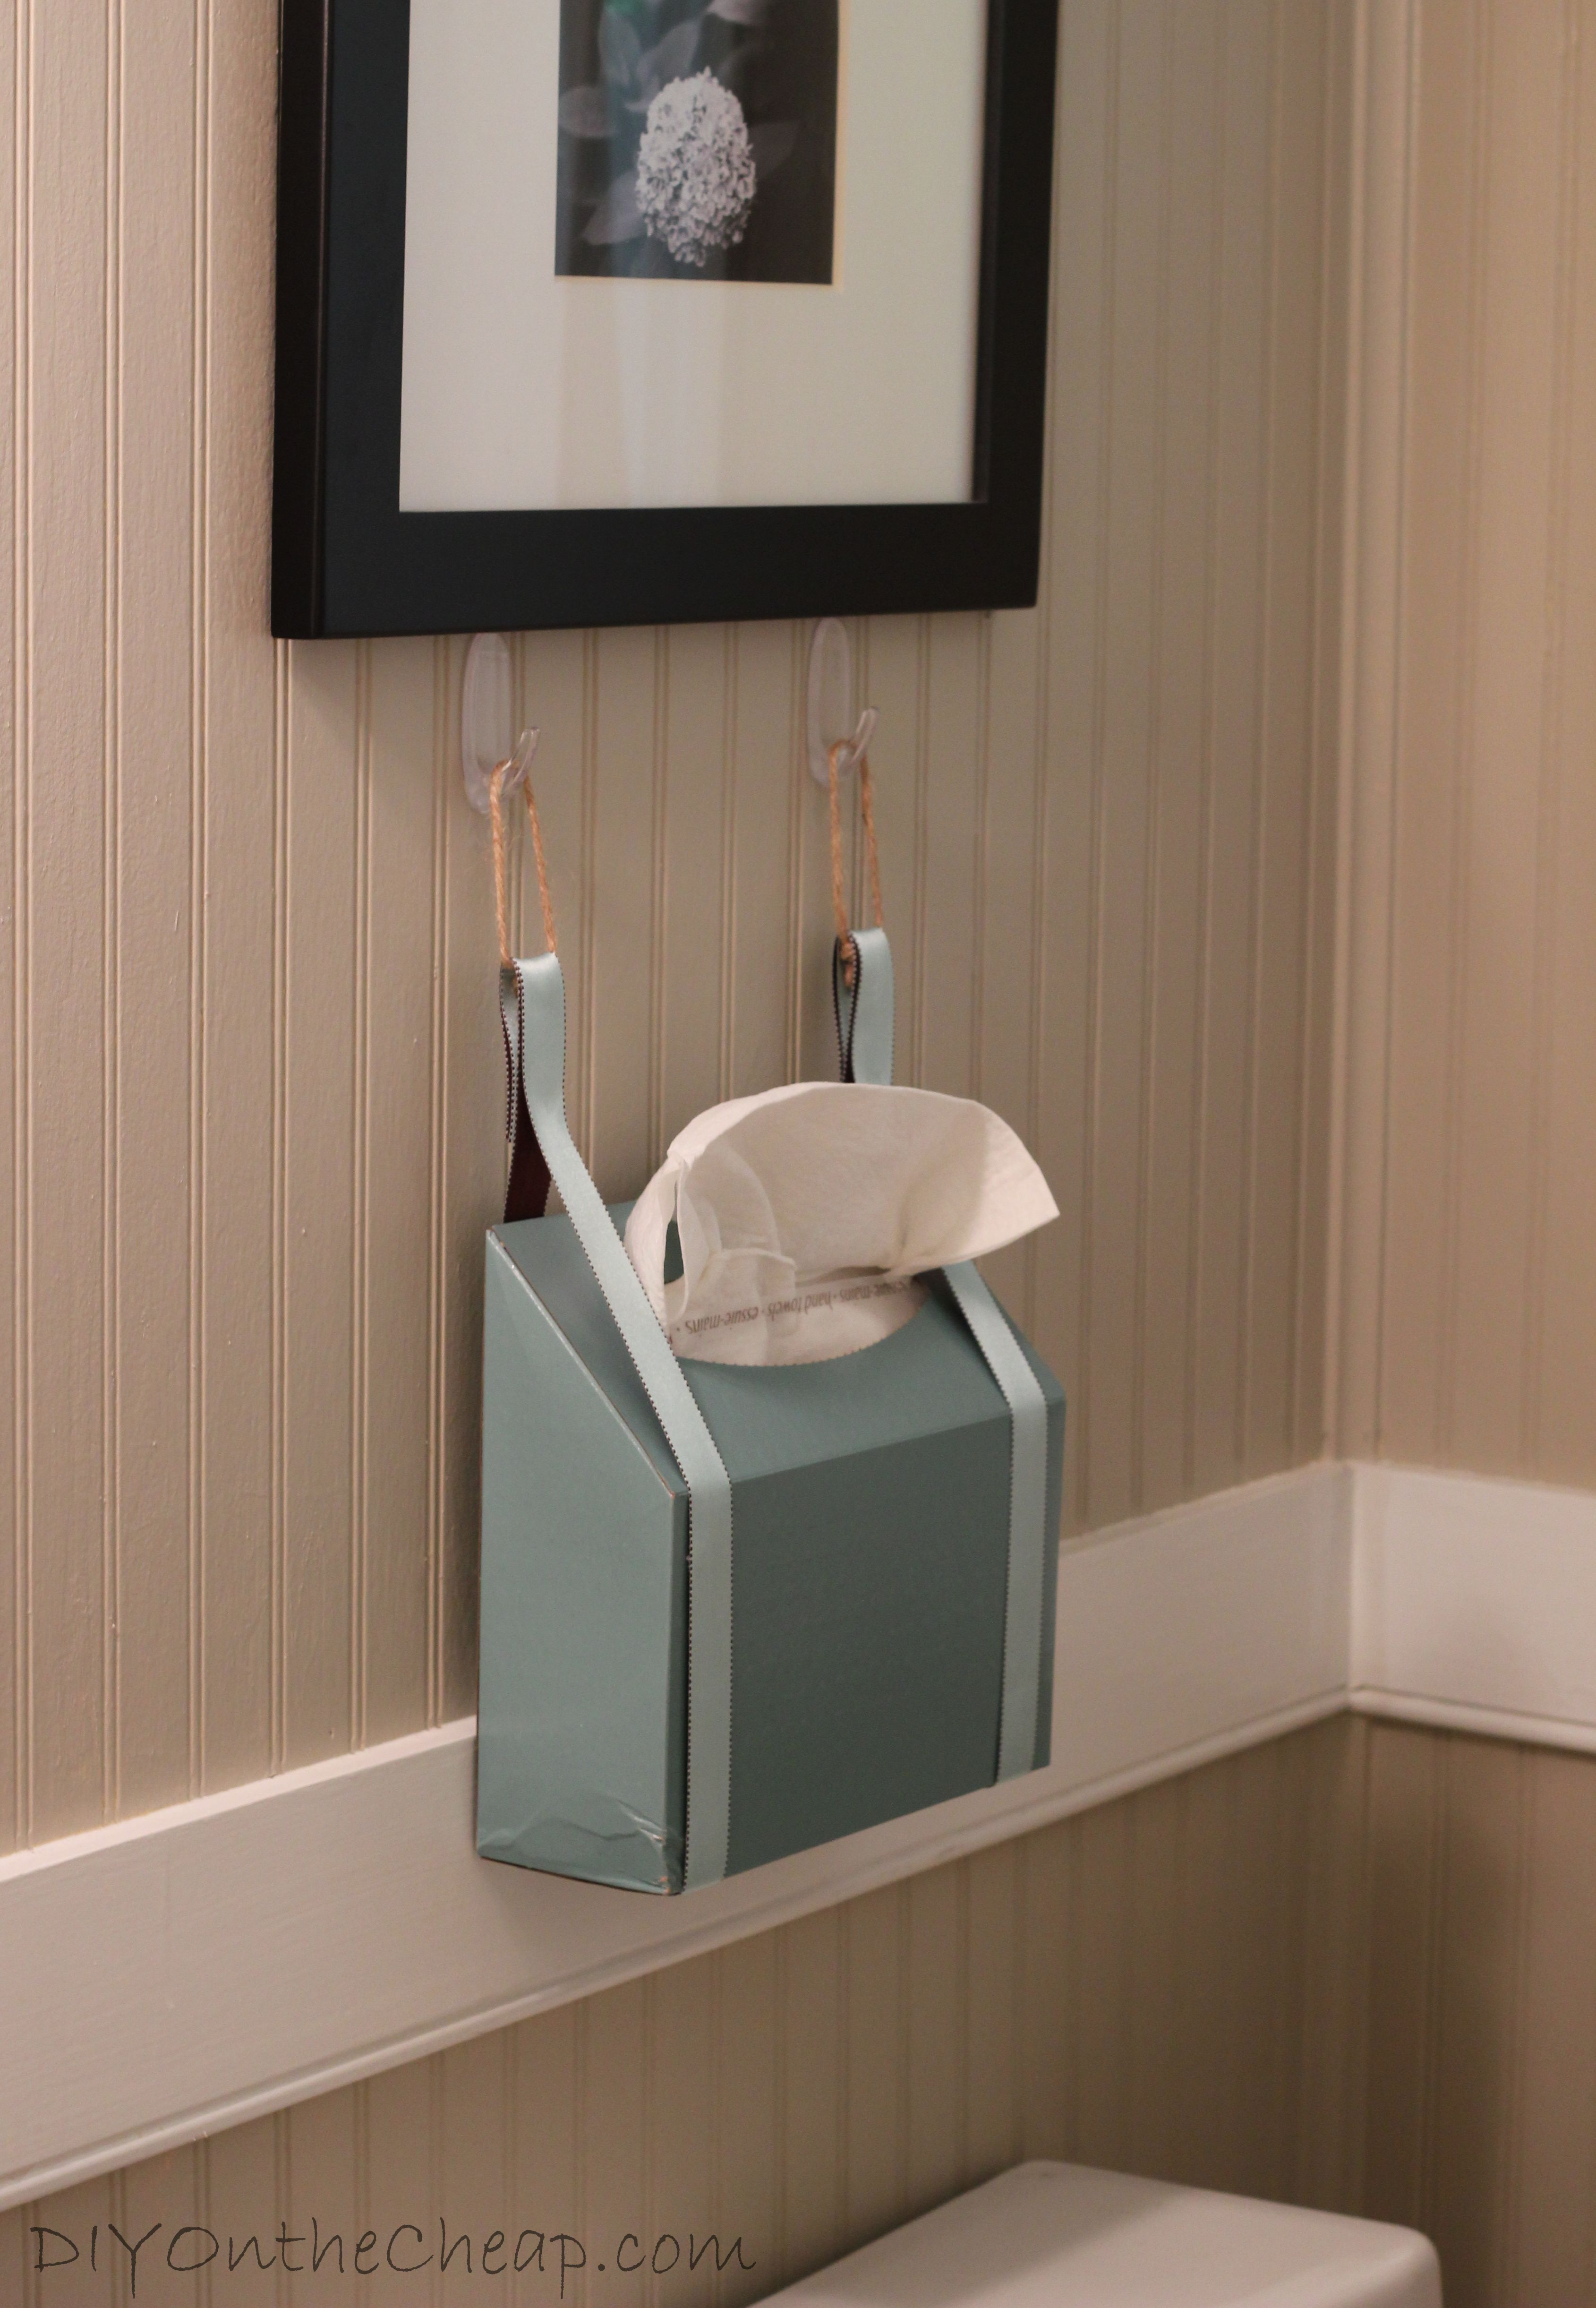 Create A Guest Ready Bathroom With Kleenex Make A Diy Kleenex Hand Towel Wall Holder Cgc Hand Towels Bathroom Bathroom Hand Towel Holder Kleenex Hand Towels